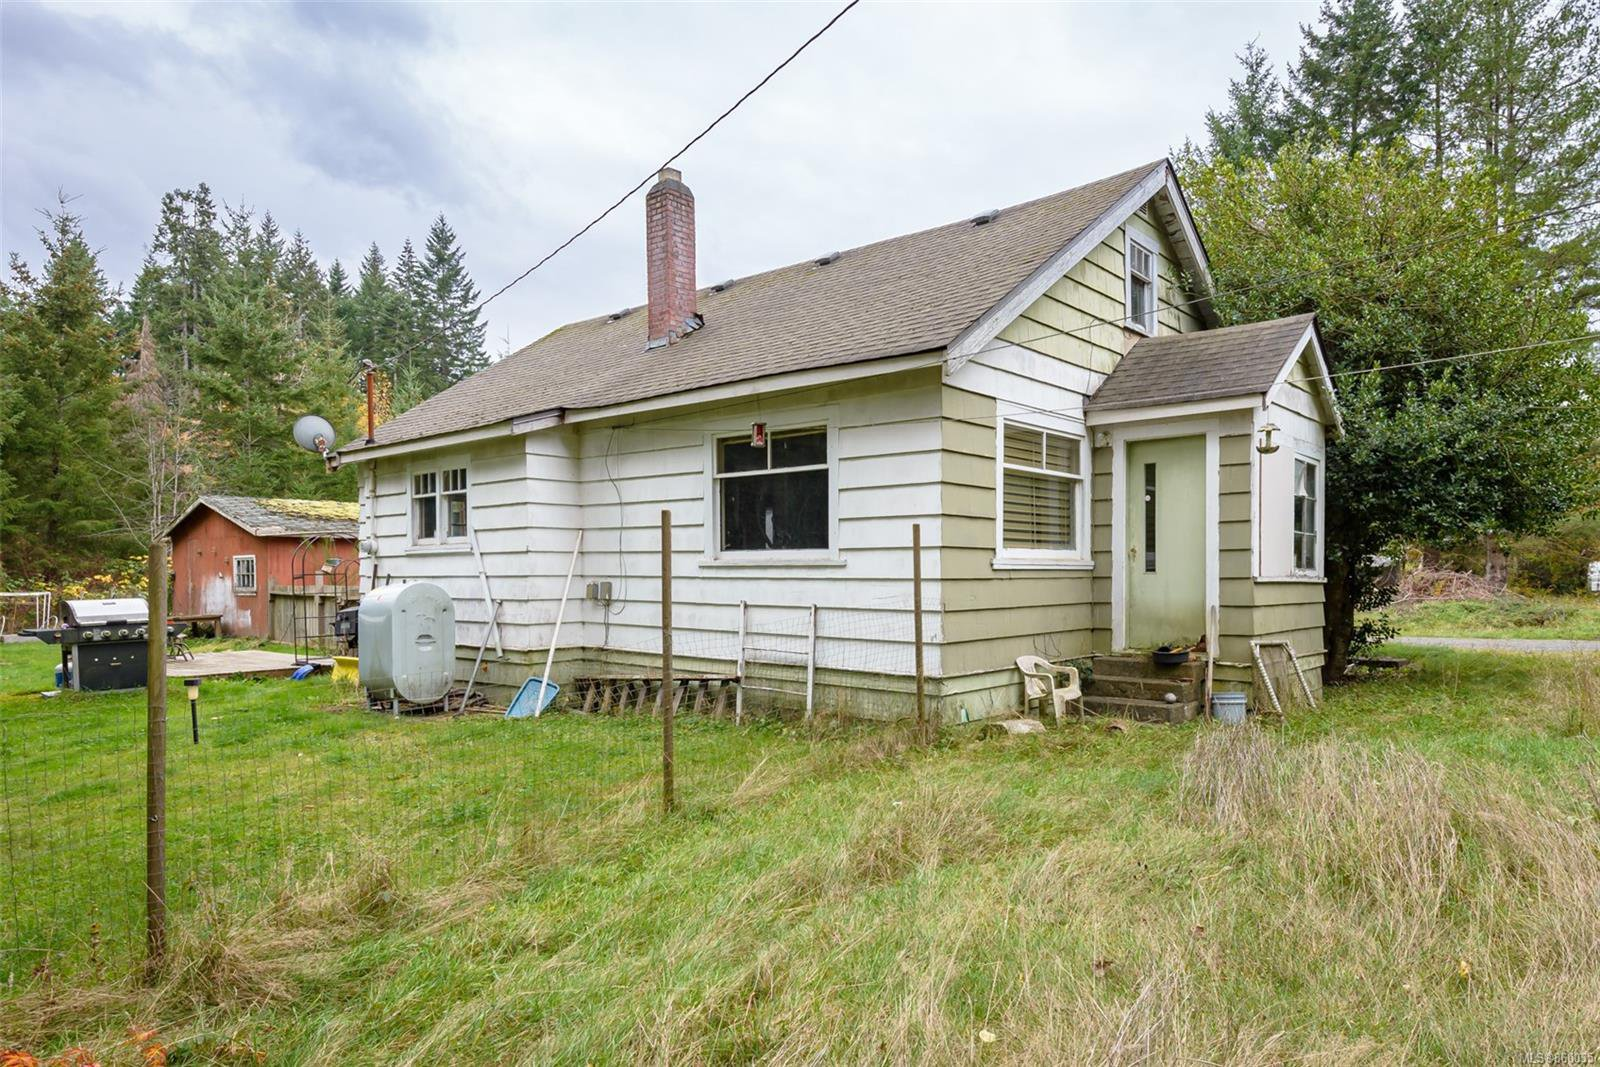 Main Photo: 2627 Merville Rd in : CV Merville Black Creek House for sale (Comox Valley)  : MLS®# 860035